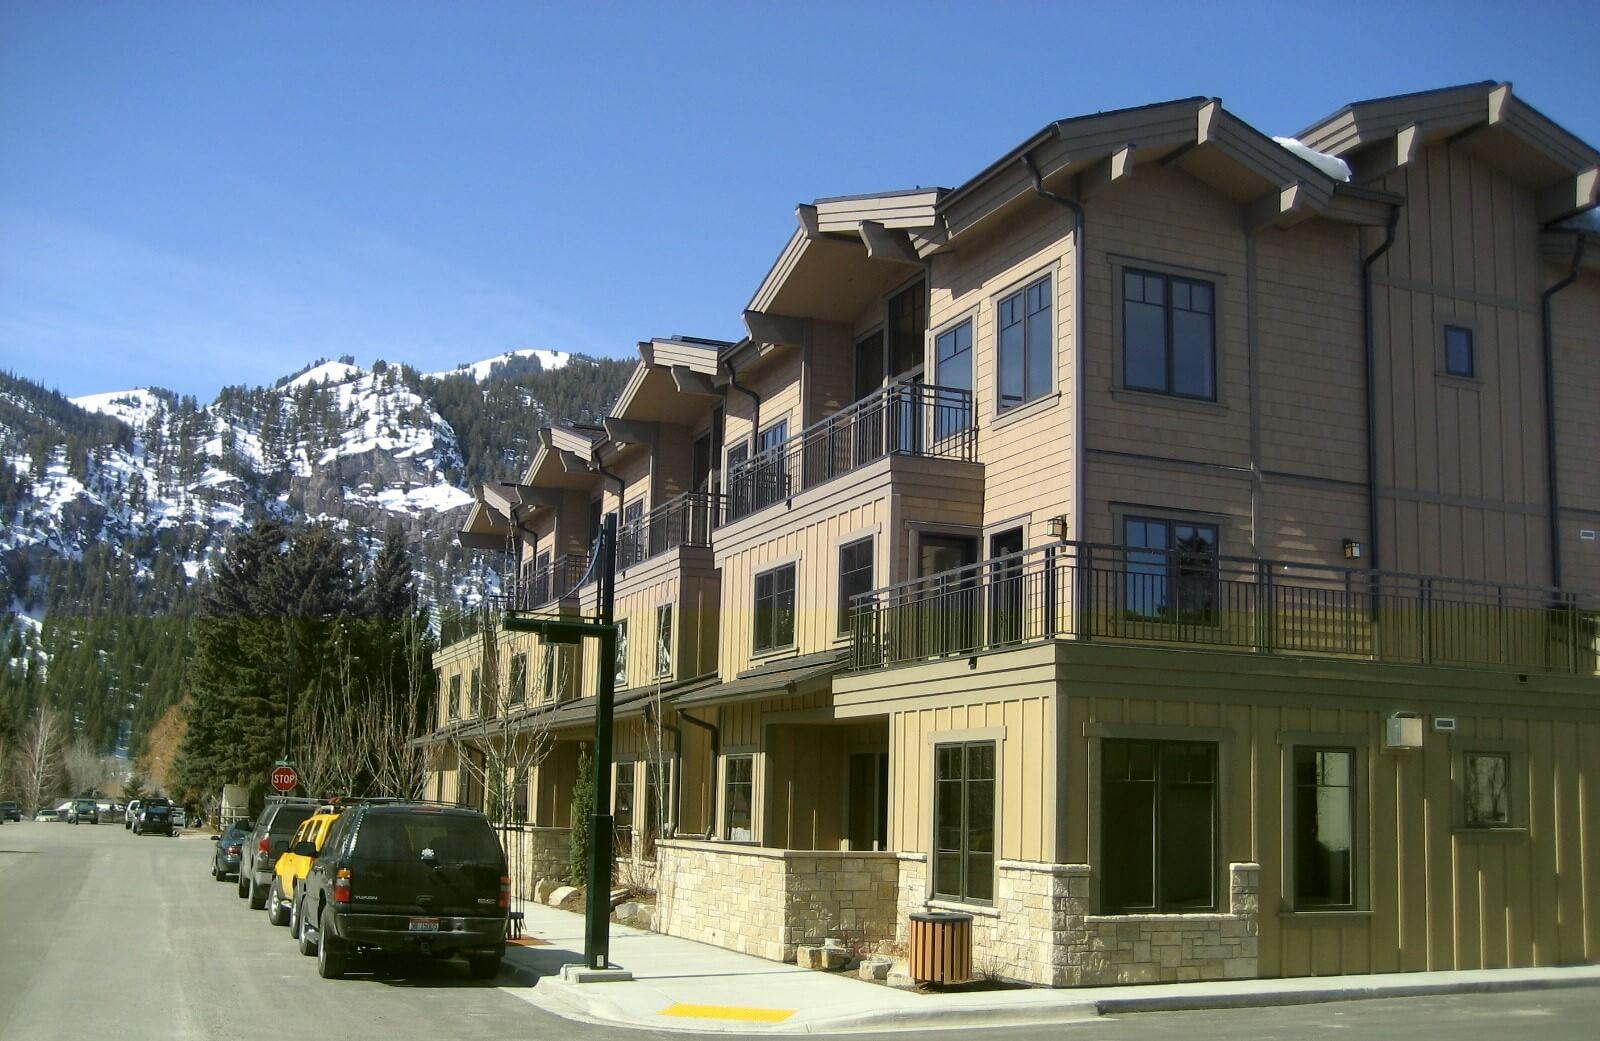 Chilali Lodge